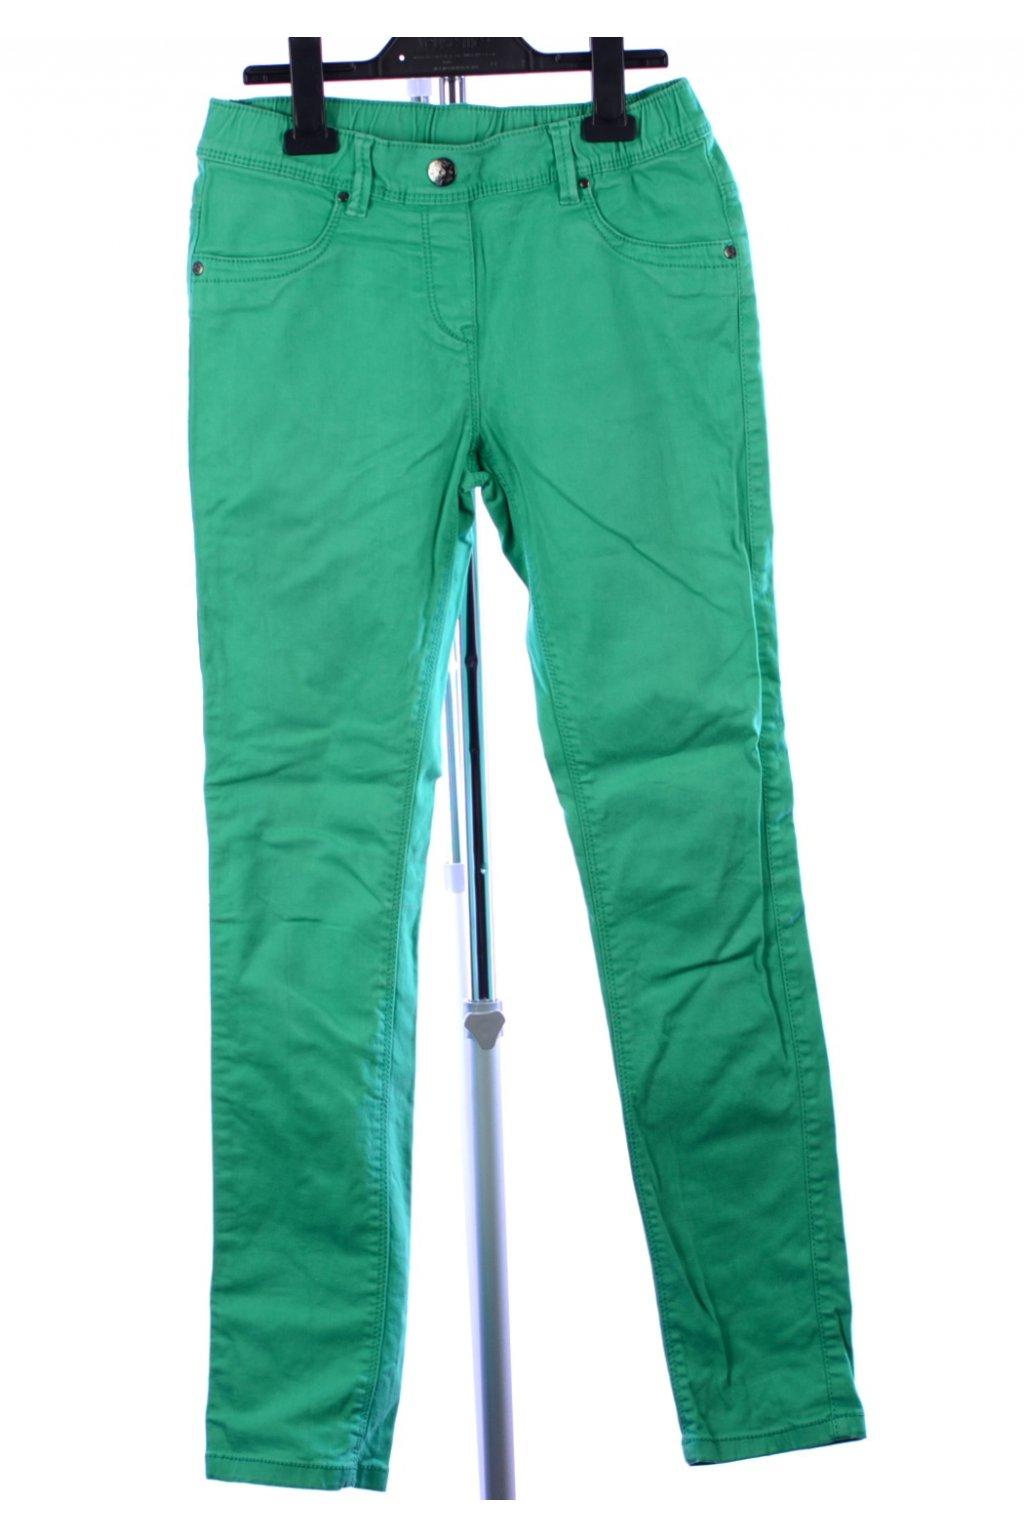 Kalhoty rifle C&A vel 164 zelené